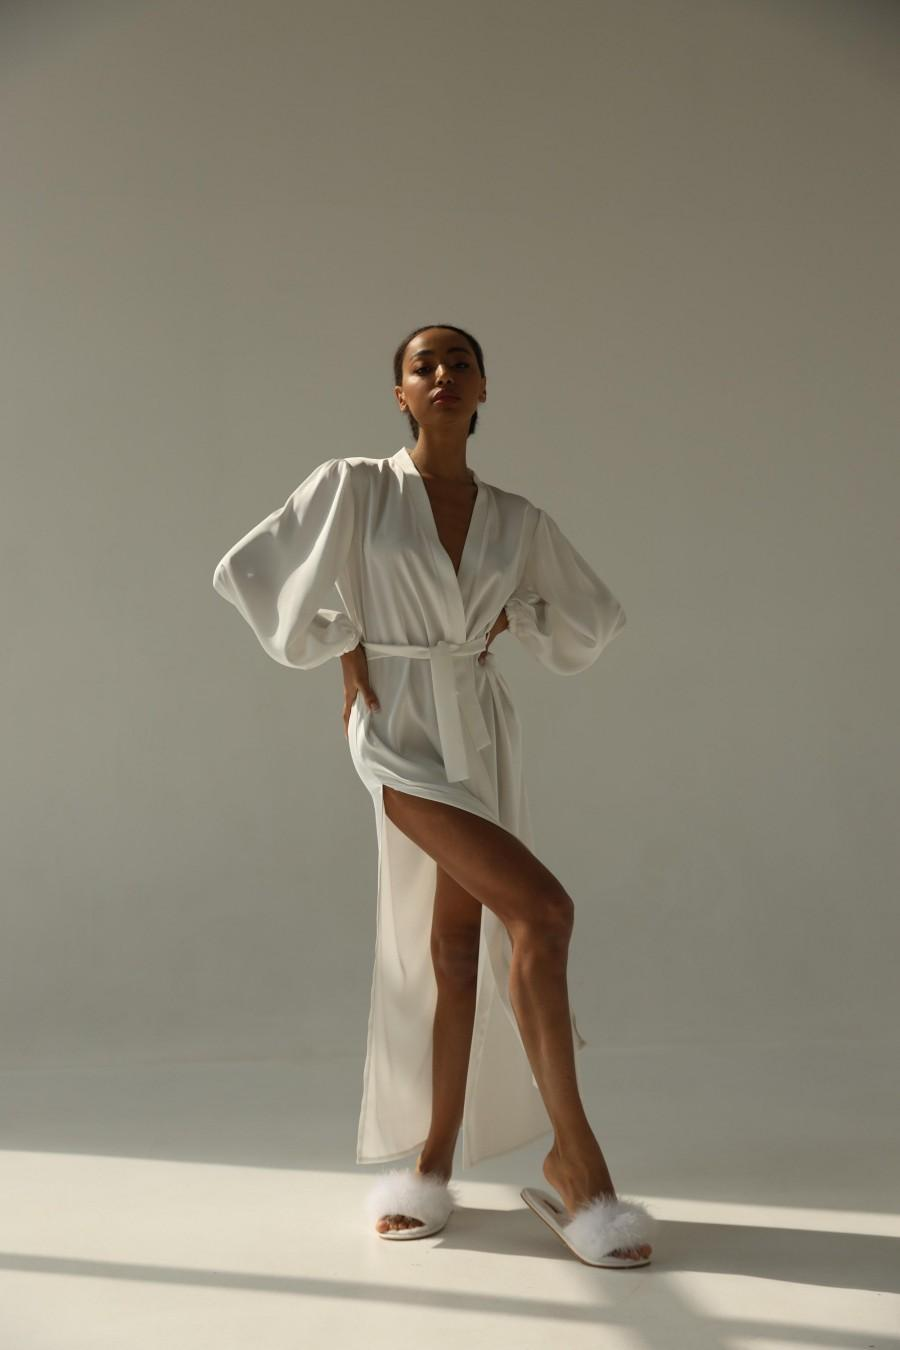 Wedding - Bridal robe with wide sleeves Bride robe Long white robe Satin silk boudoir robe Dressing gown  Bridesmaid gift